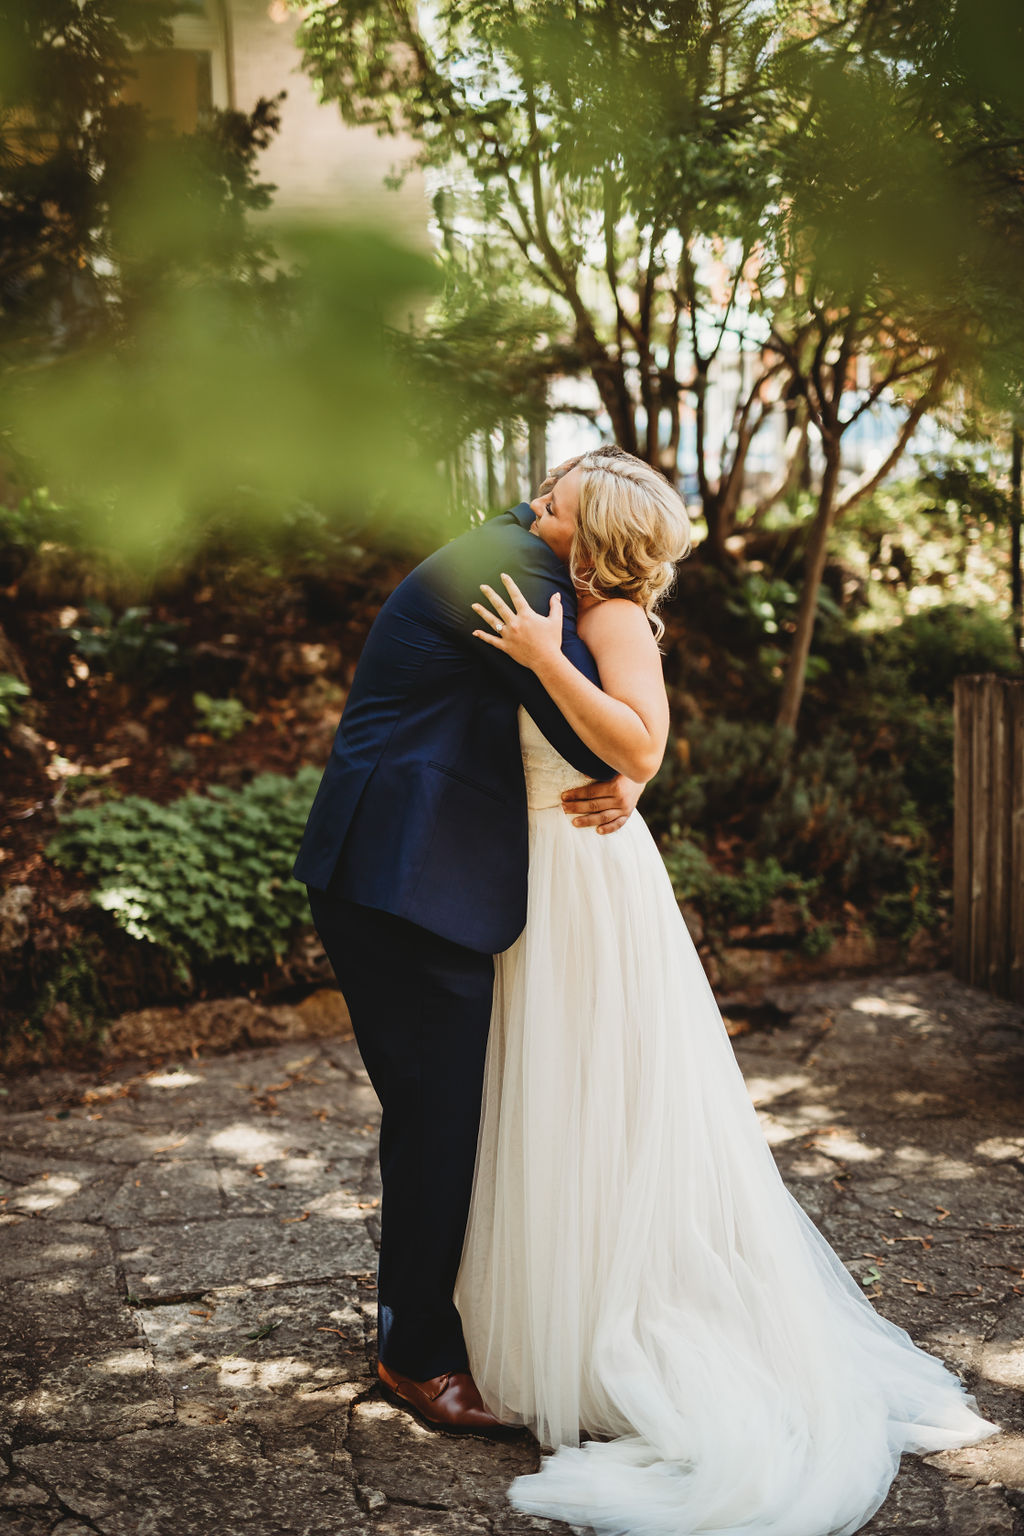 engle-olson-katie-dalton-wedding-clewell-photography-38.jpg